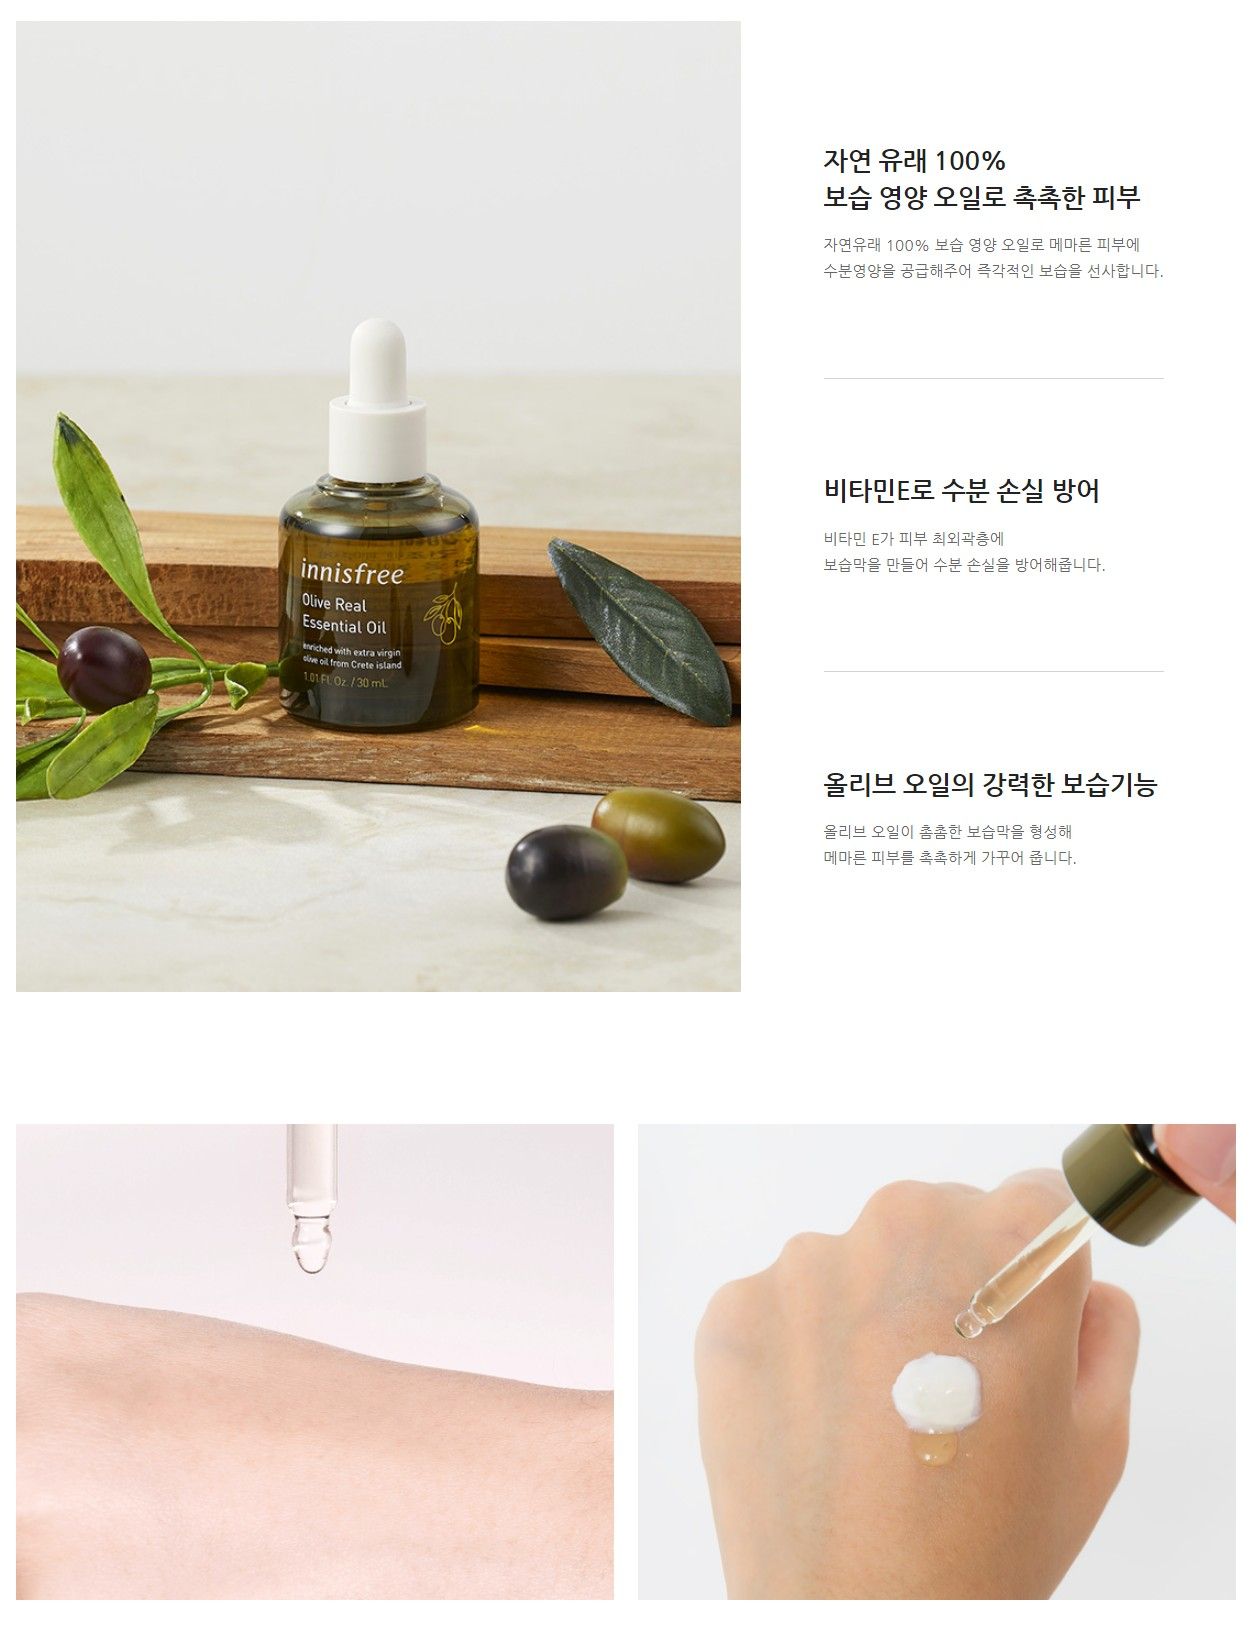 Innisfree Olive Real Essential Oil